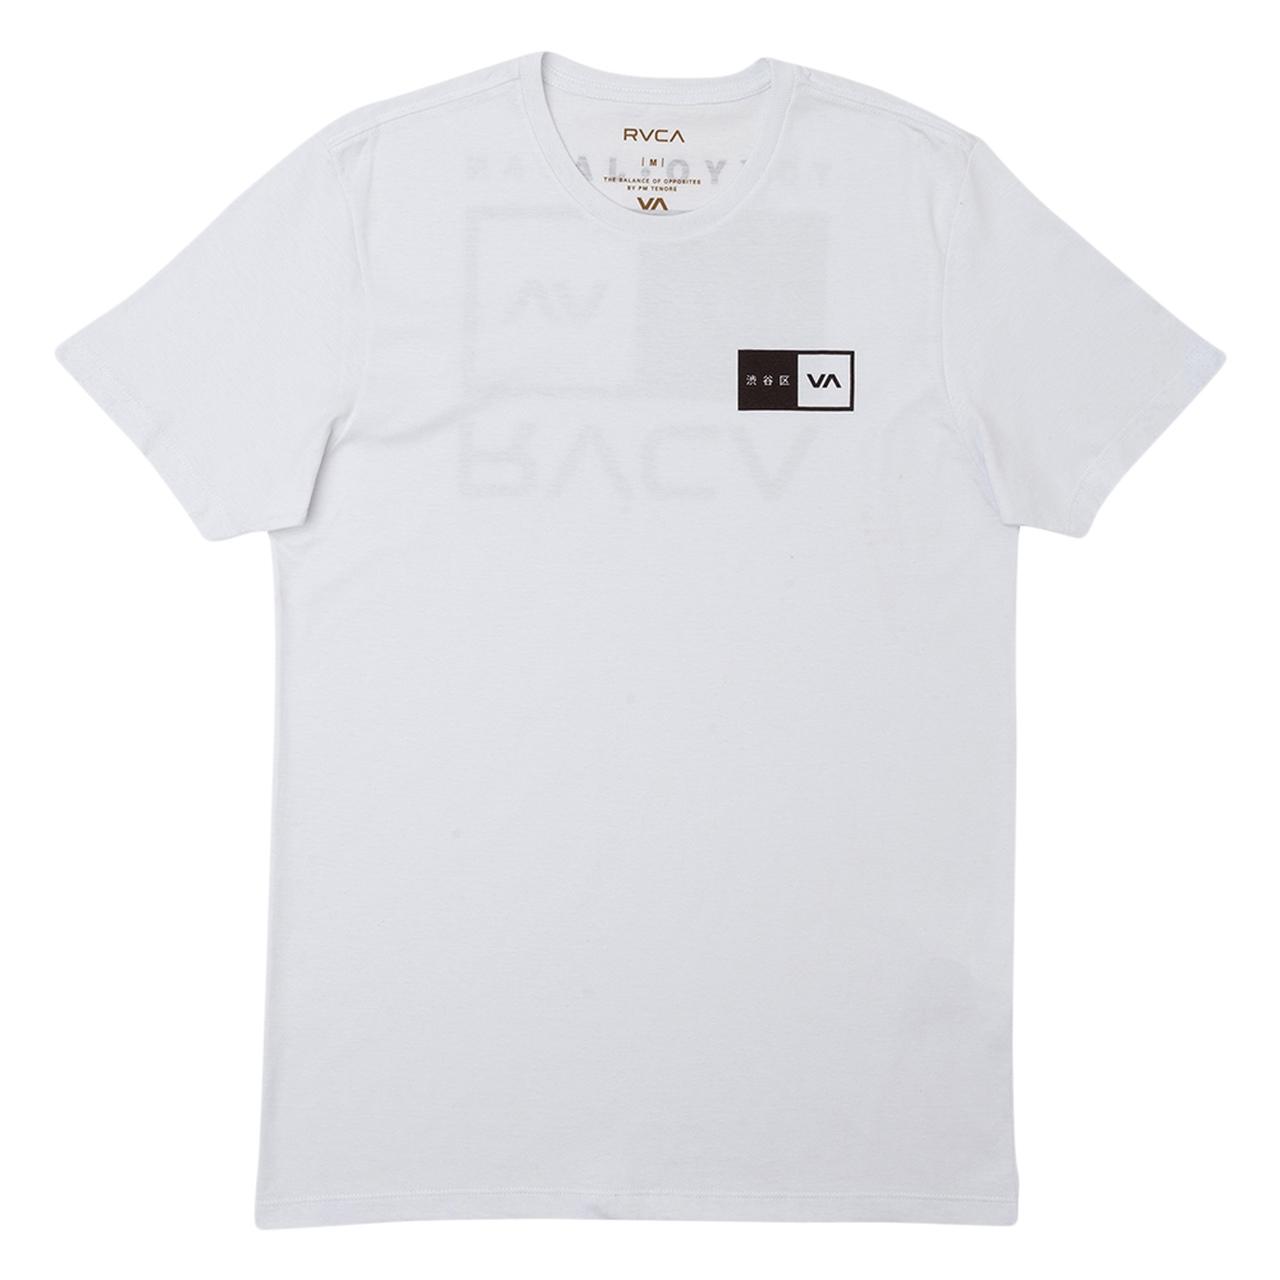 Camiseta Rvca Tokyo Balance Box Branca